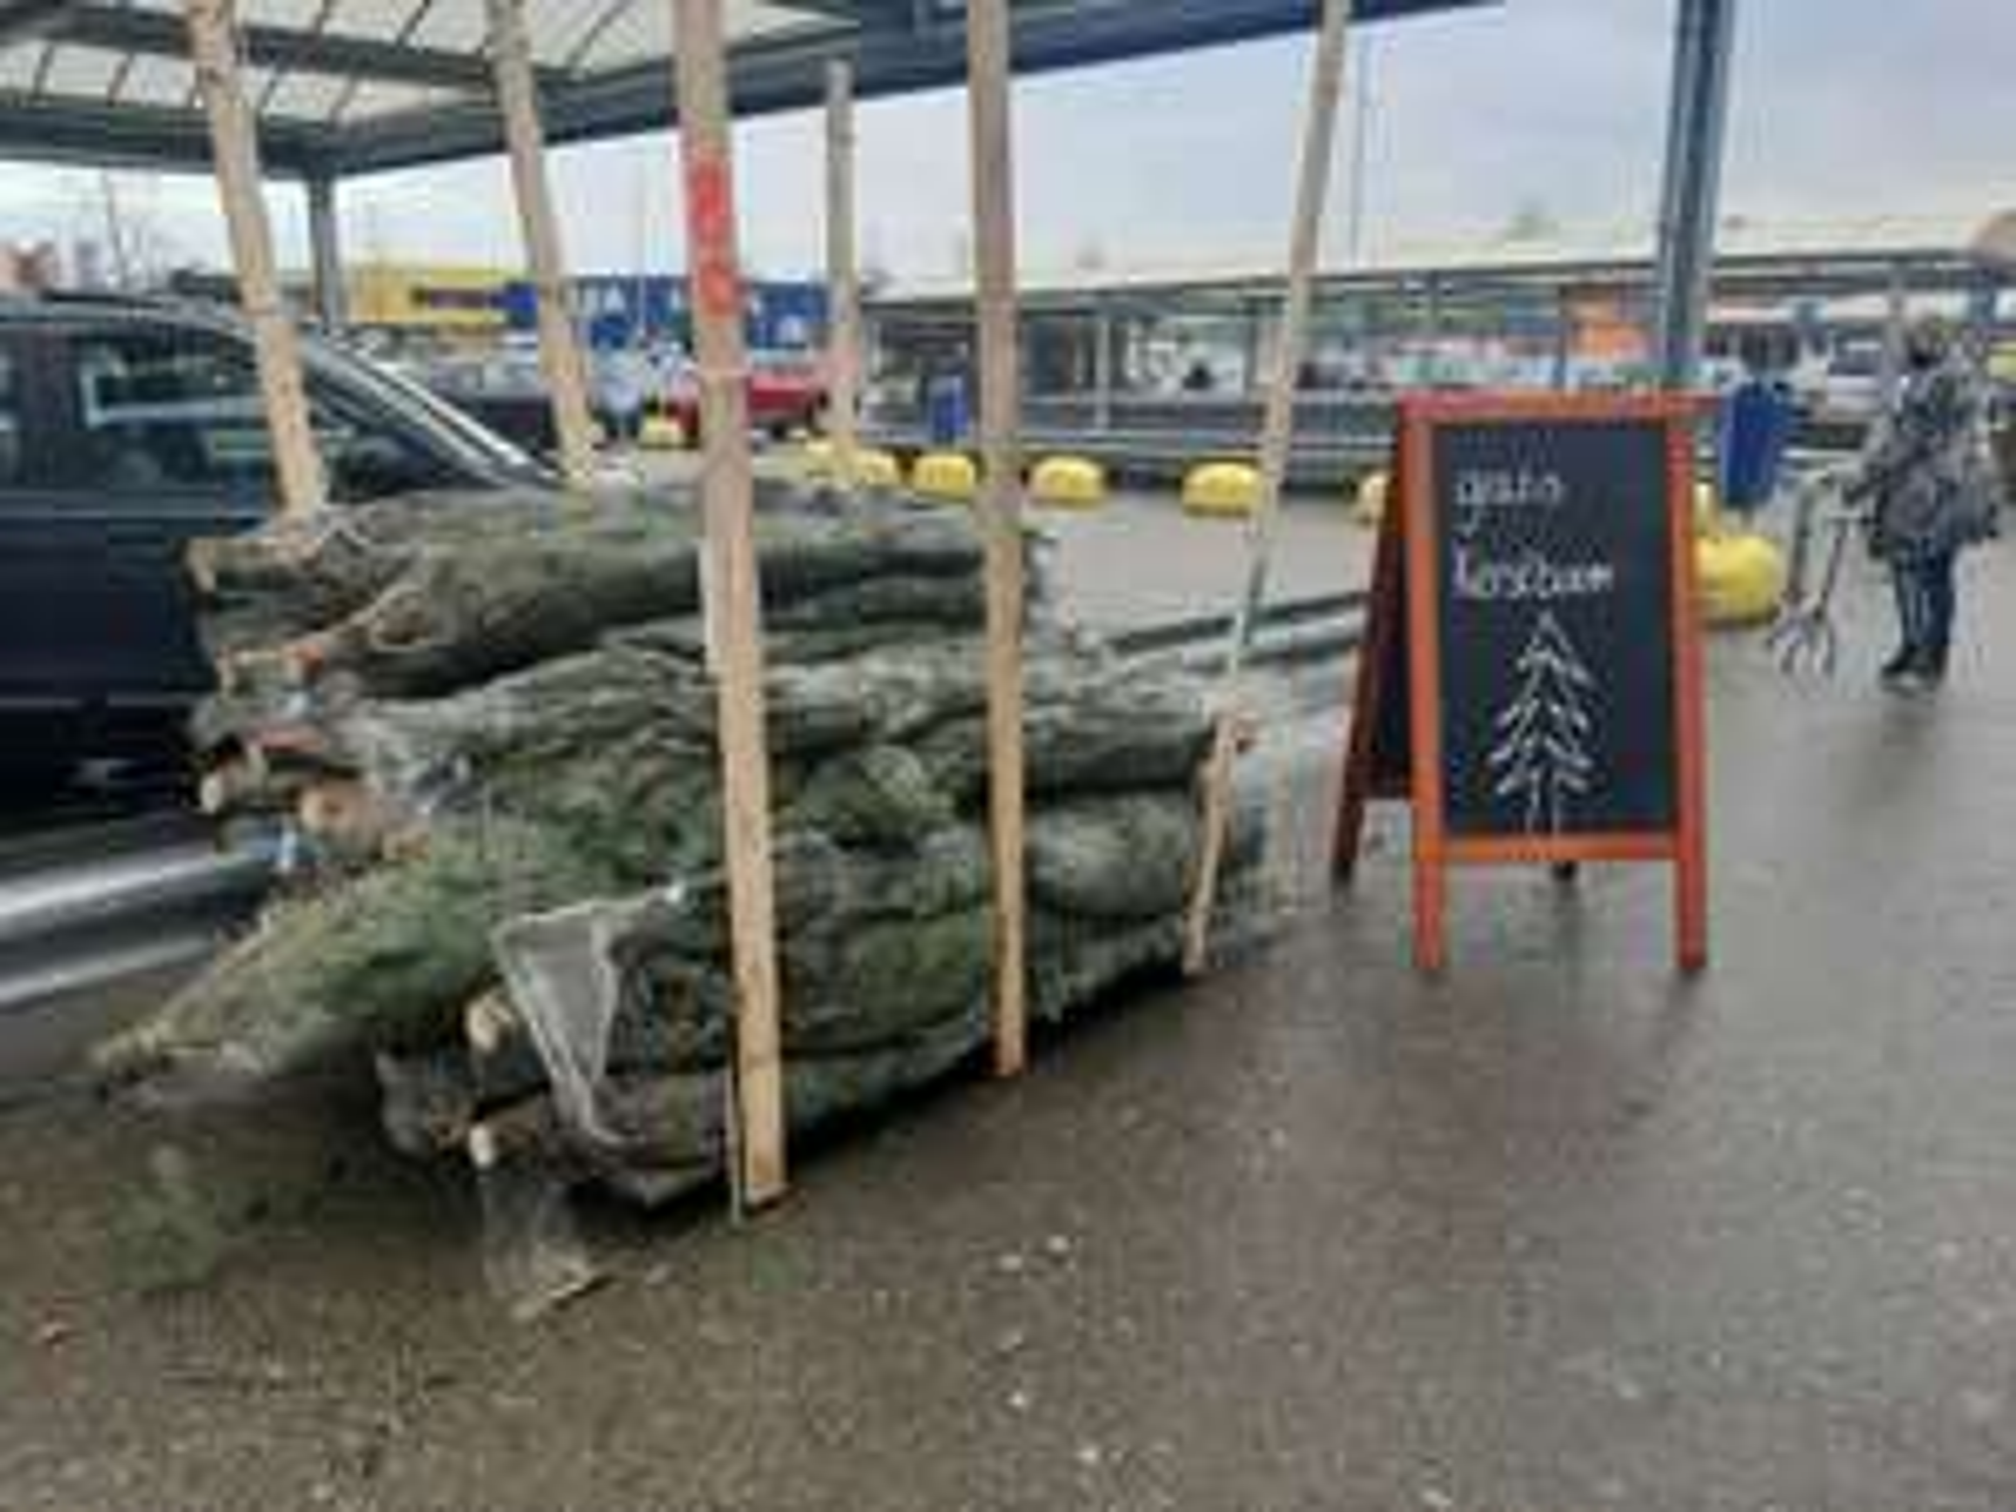 Gratis Nordmann kerstbomen Makro Duiven